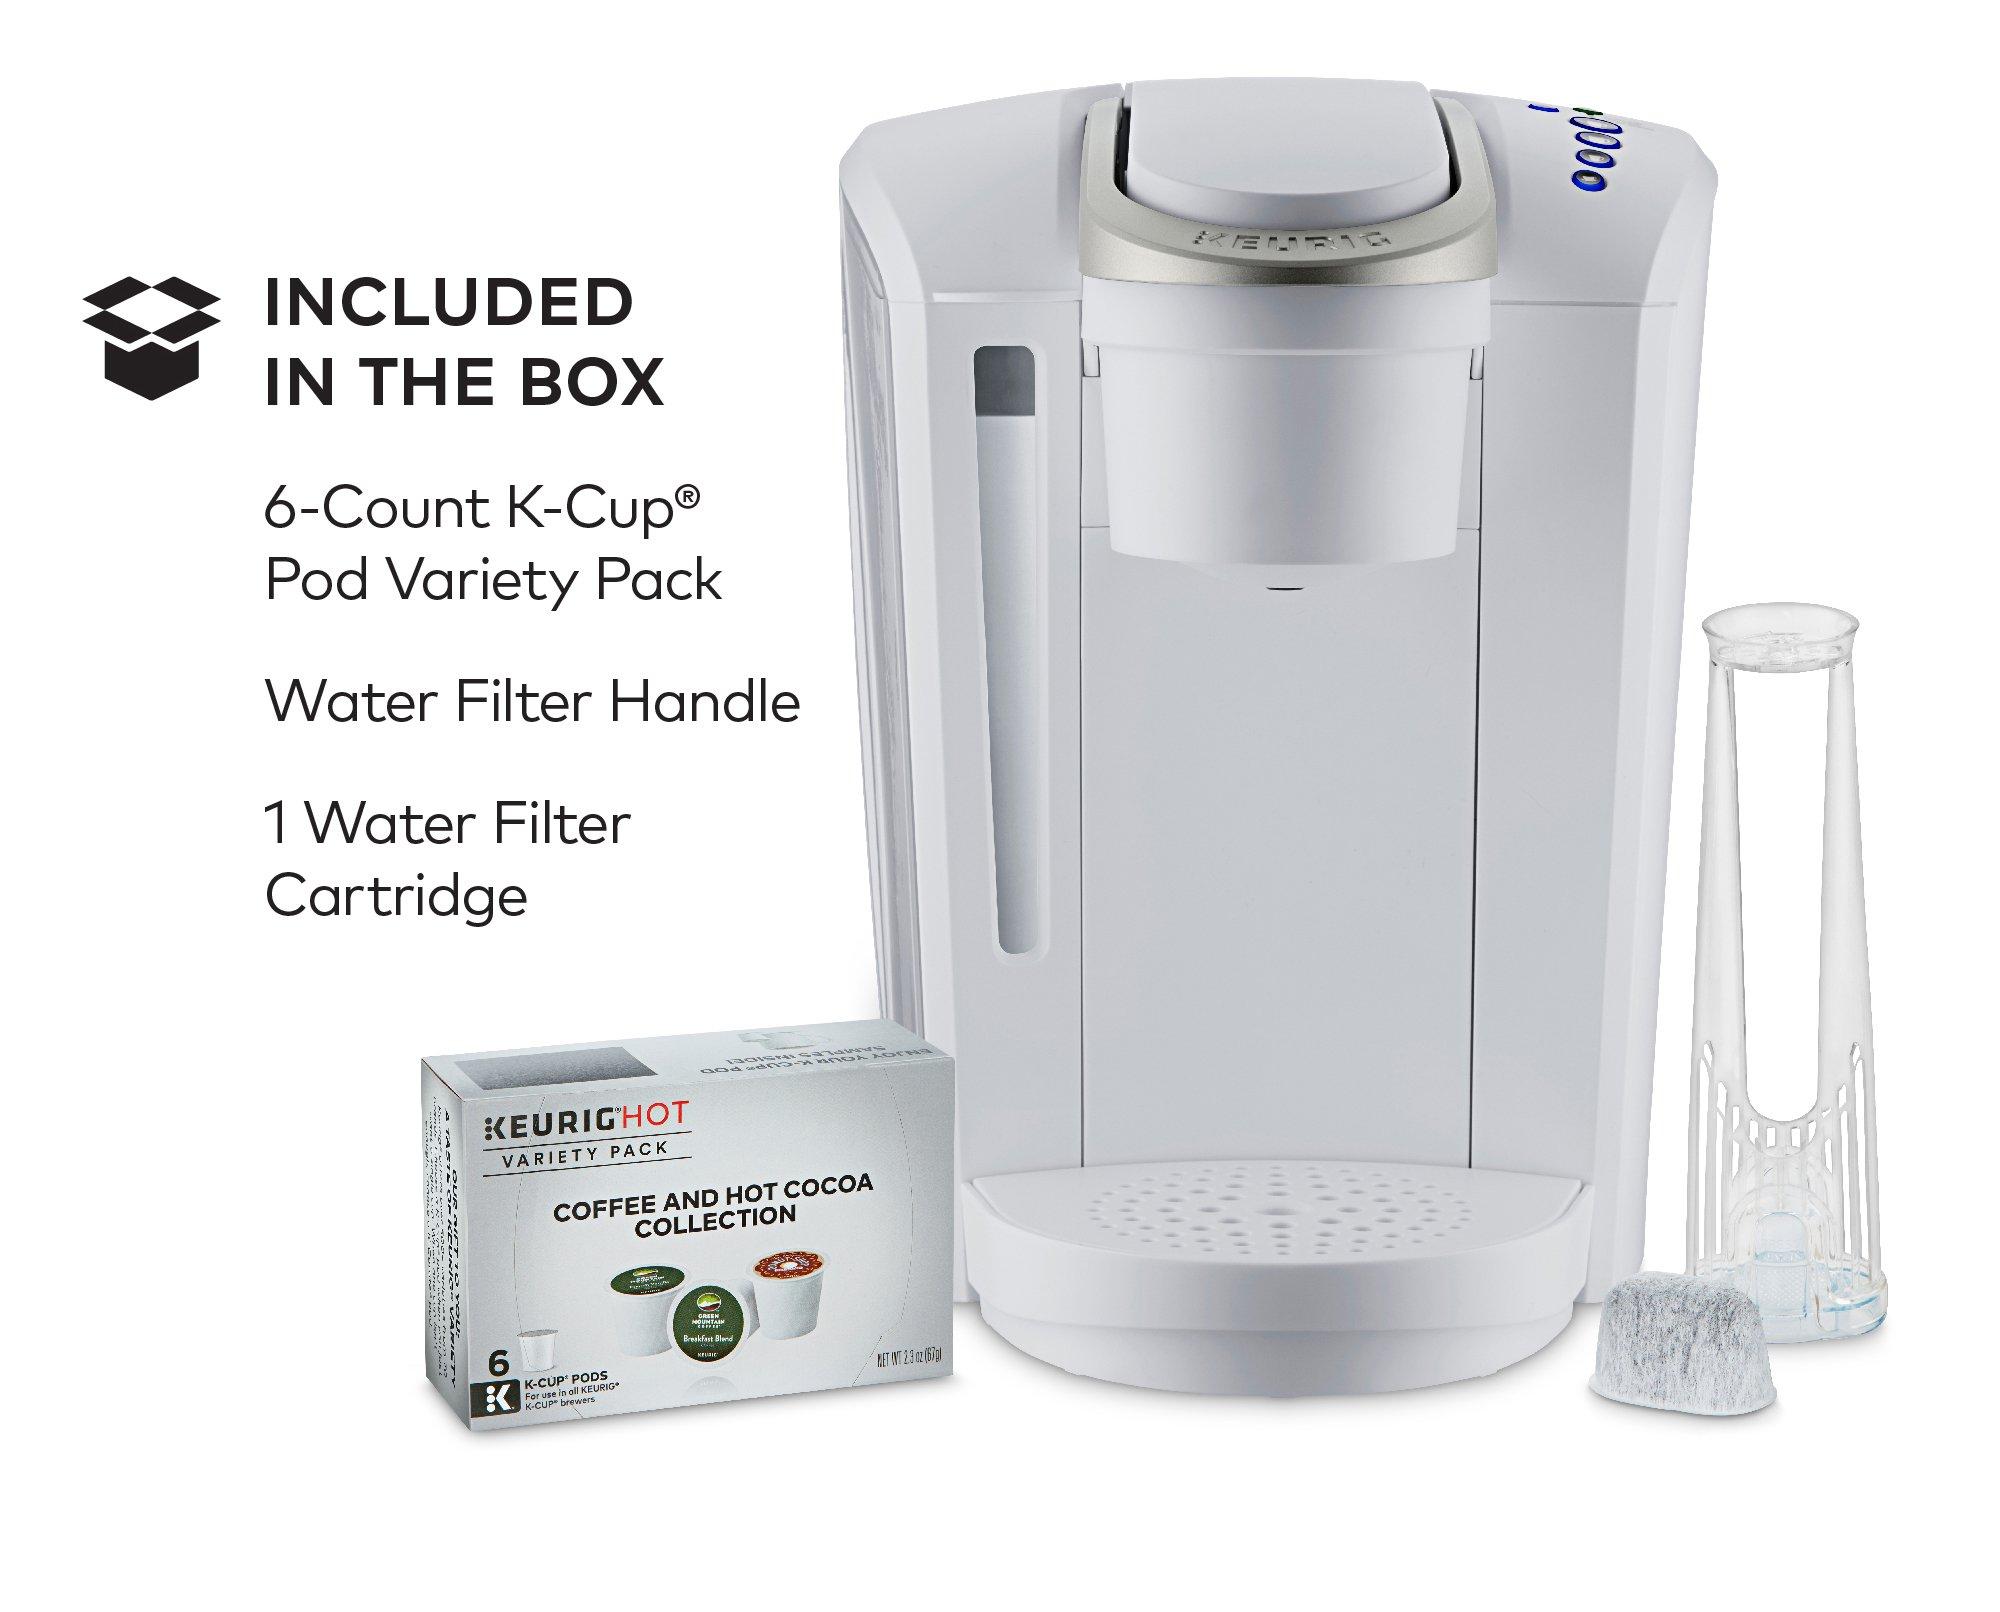 Keurig K-Select Single-Serve K-Cup Pod Coffee Maker, Matte White